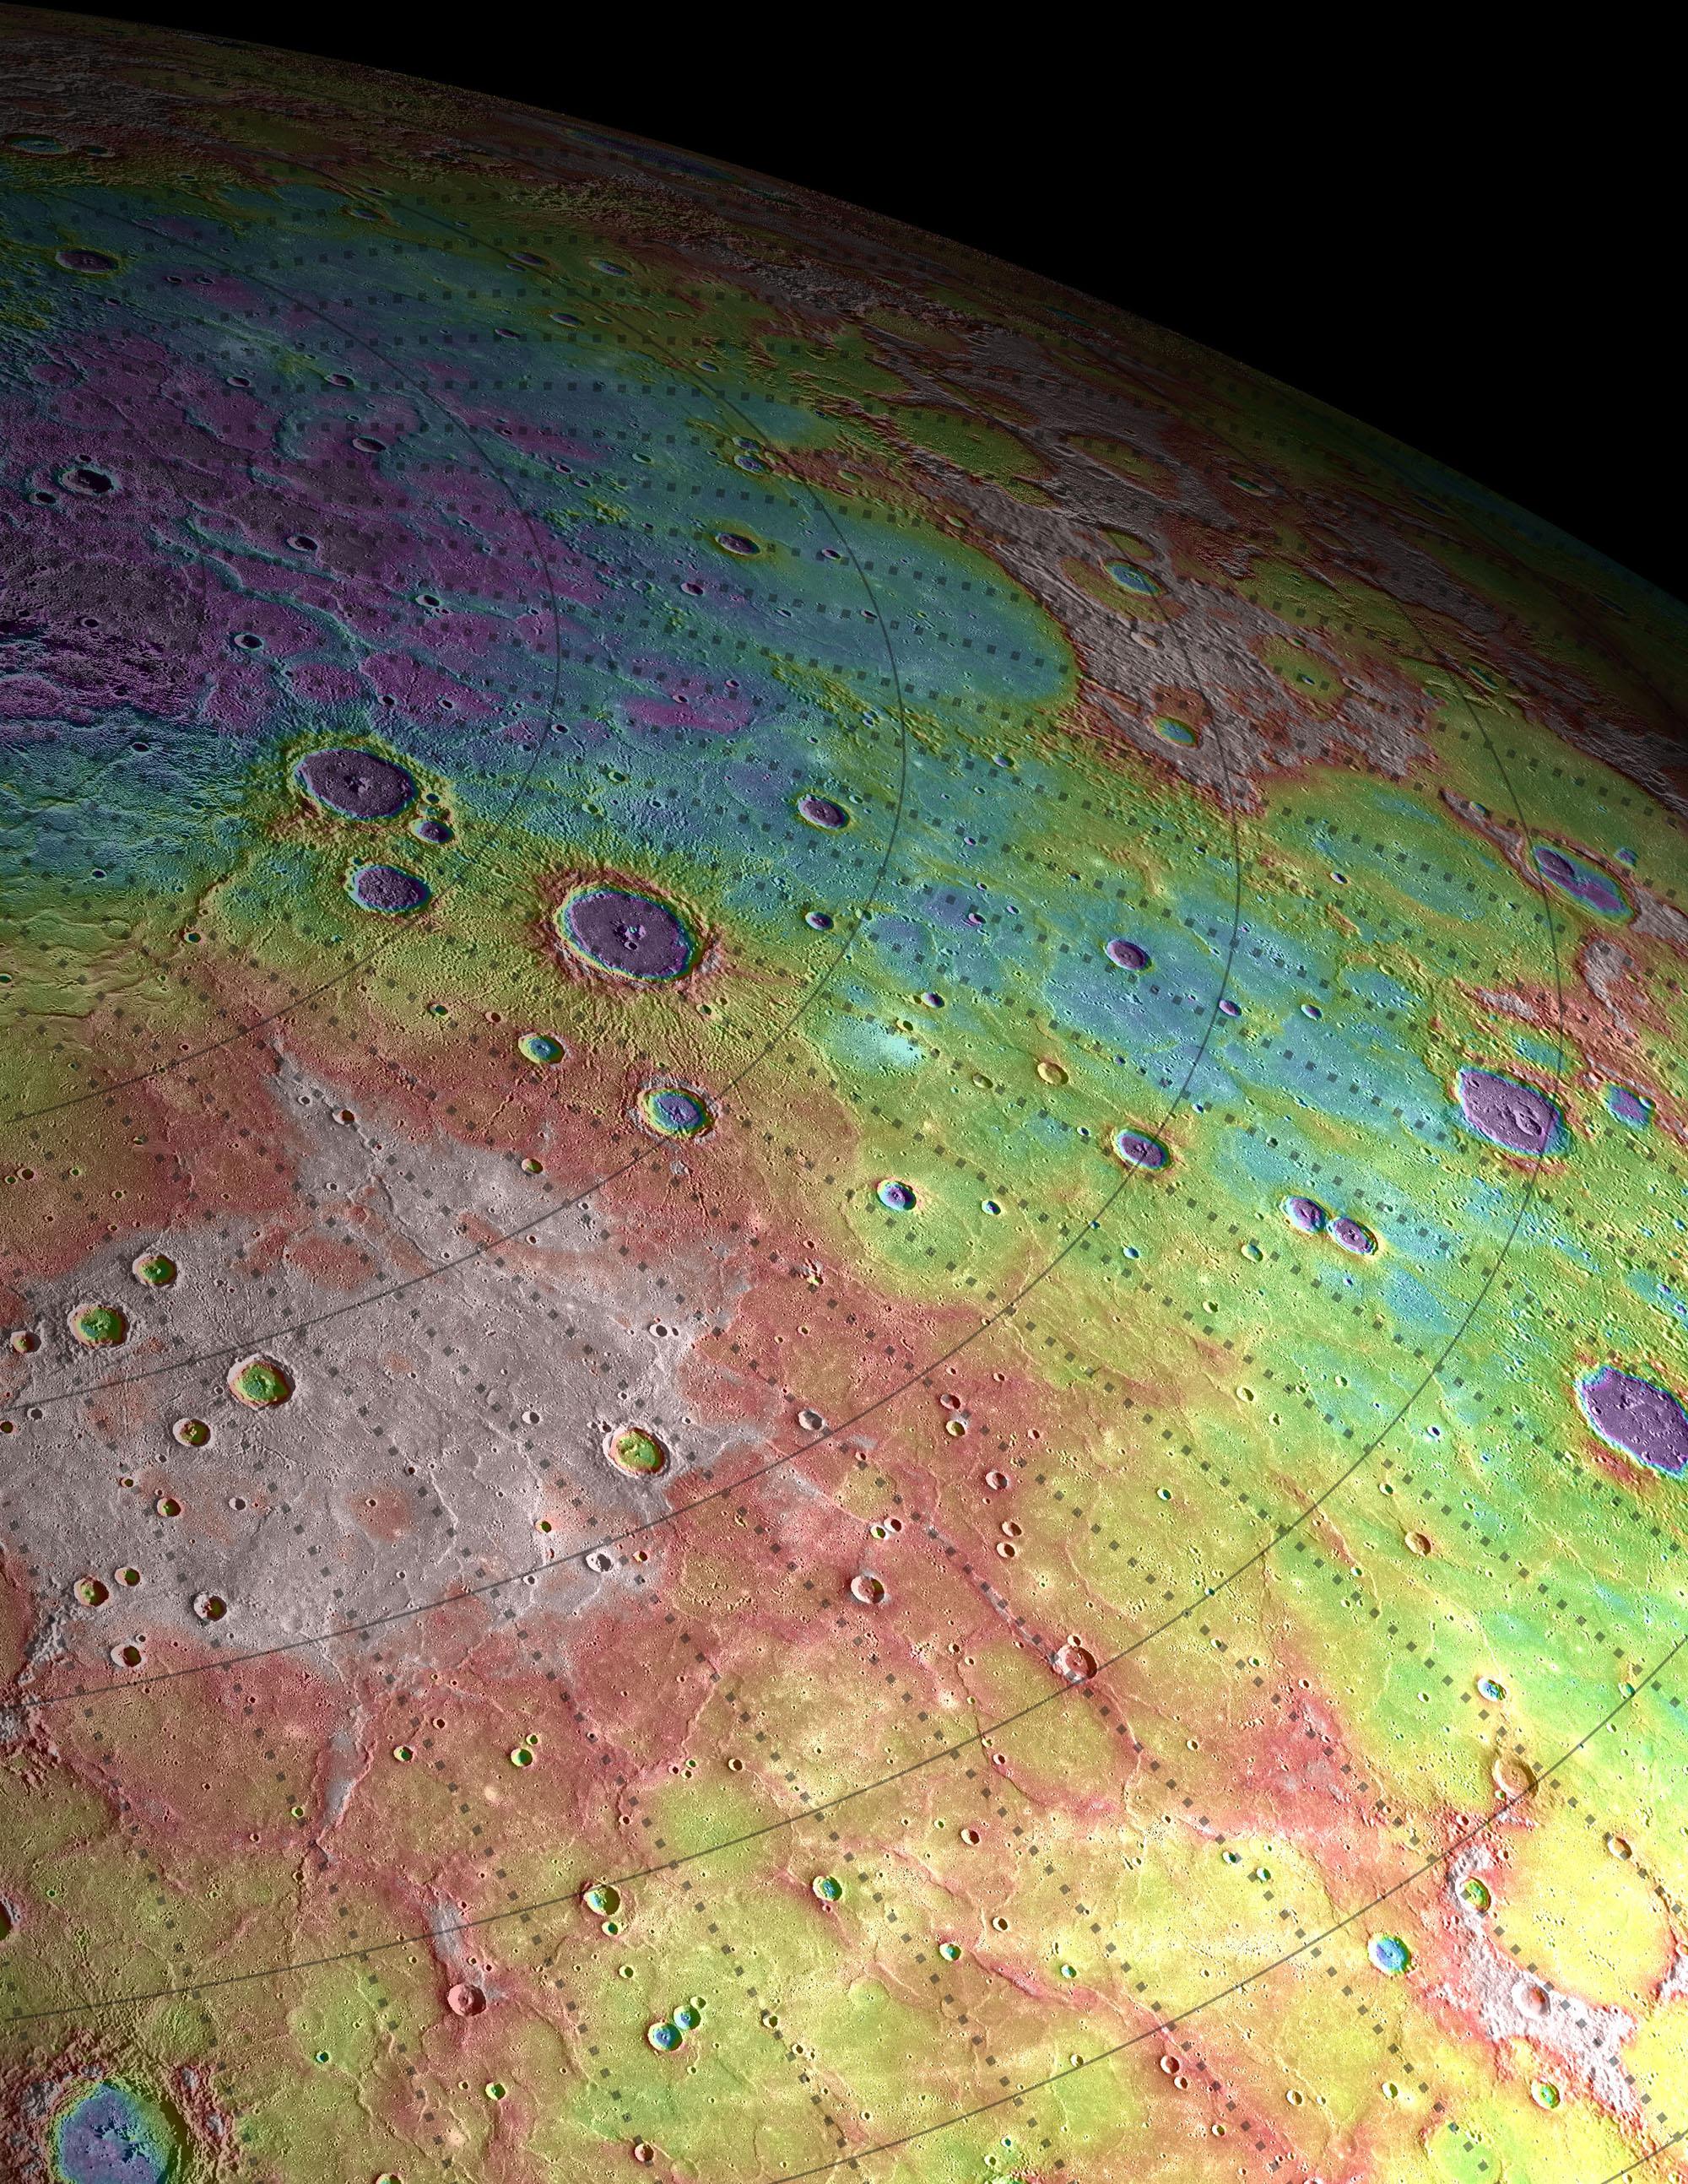 Runaway Planets, Submarines on Jupiter and a Supernova Explosion